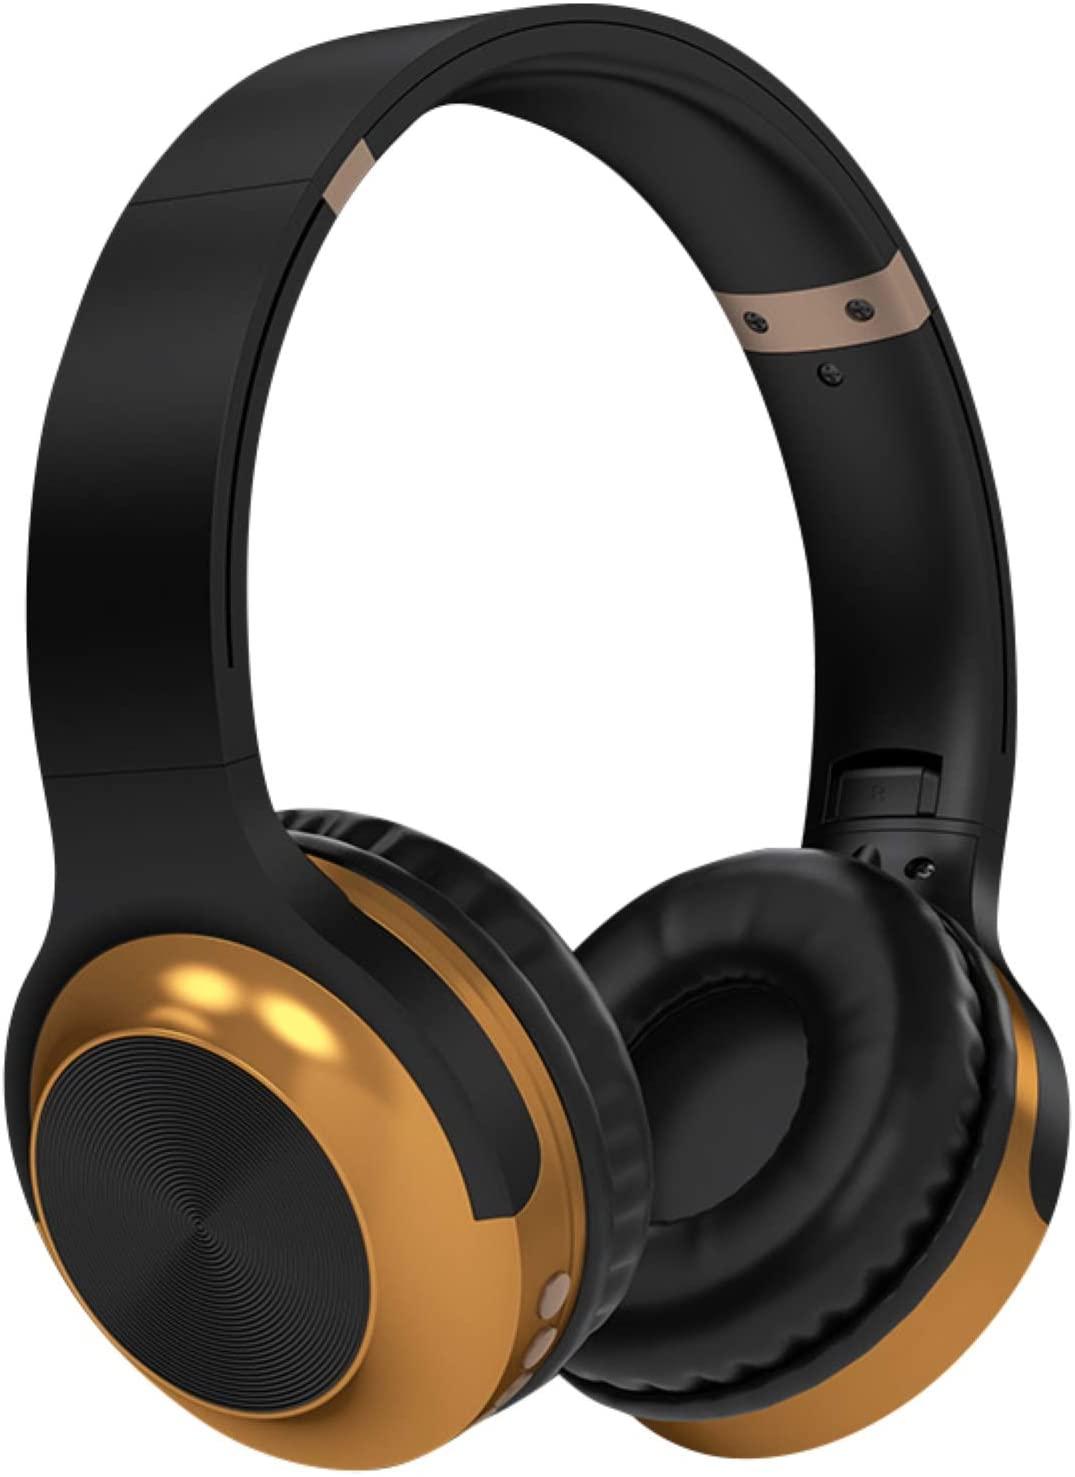 MOHALIKO Bluetooth Headphones, Wireless Headphones, A10 Head-Mounted Bluetooth Headset Stereo Wireless Card Radio Universal Earphone for School Home or Travel Black